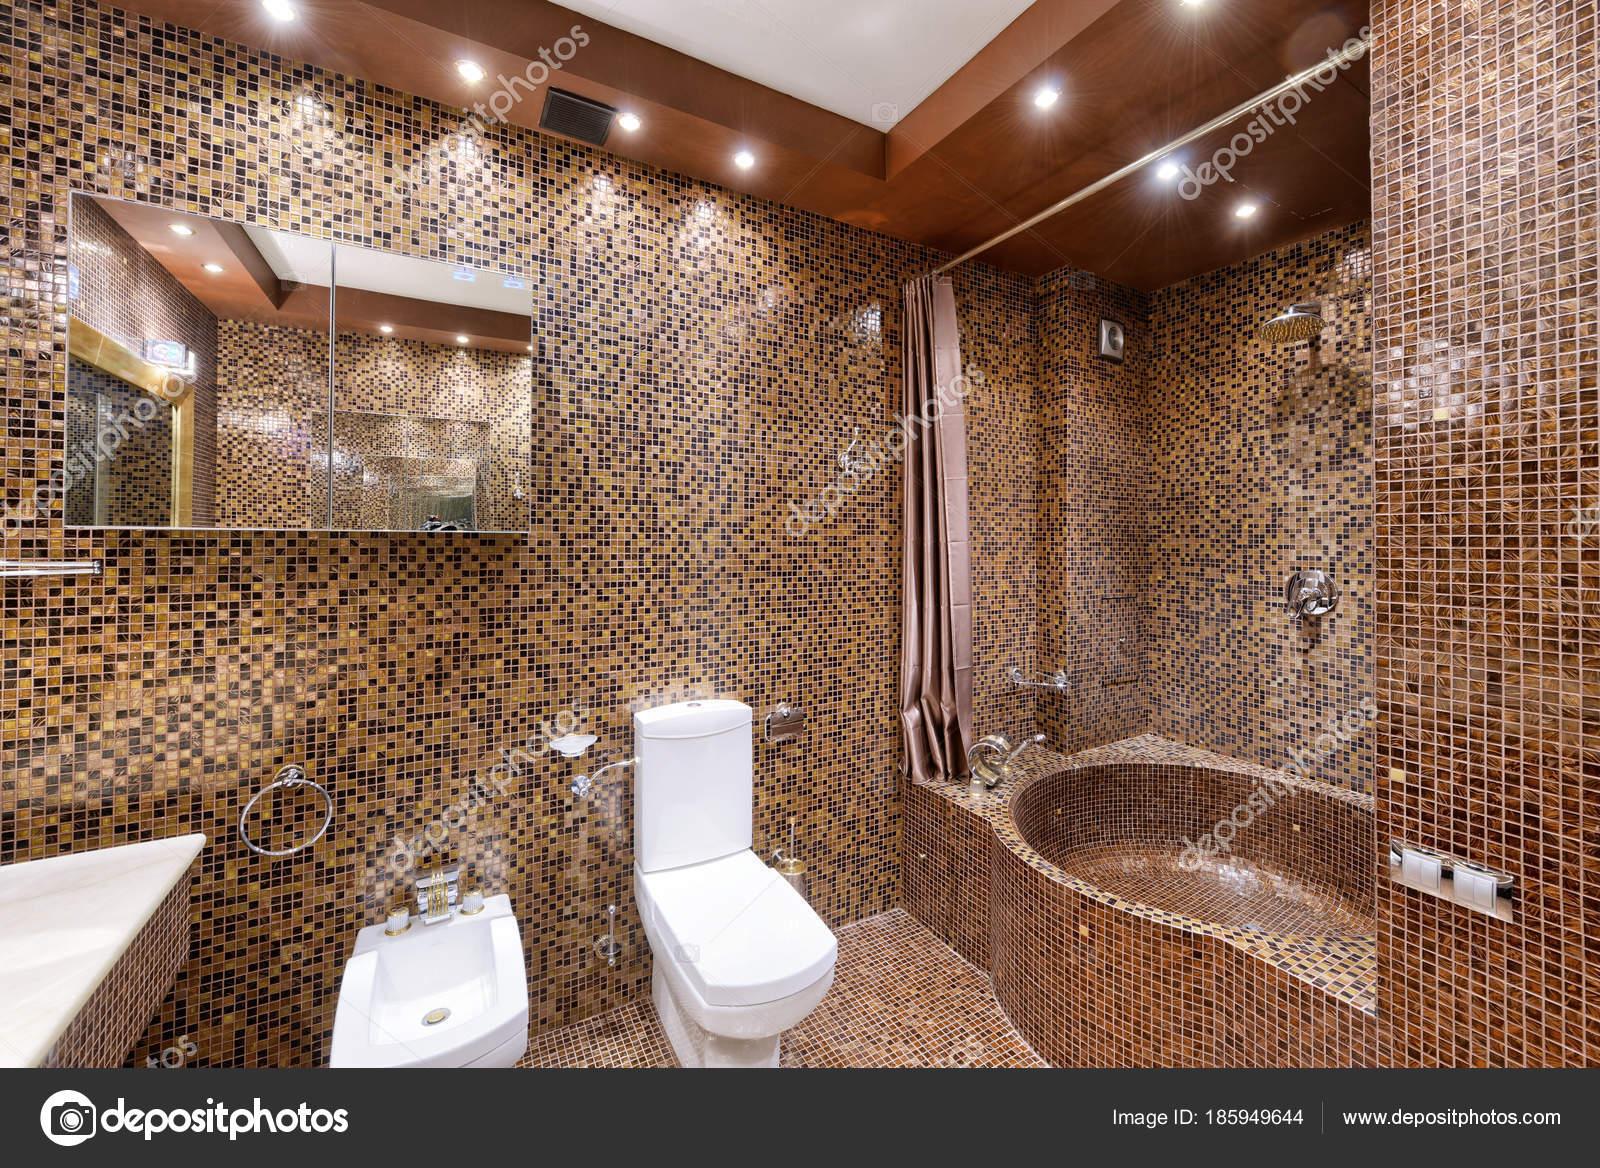 Dise o interiores casa lujo cuarto ba o elegante fotos for Banos de casas de lujo